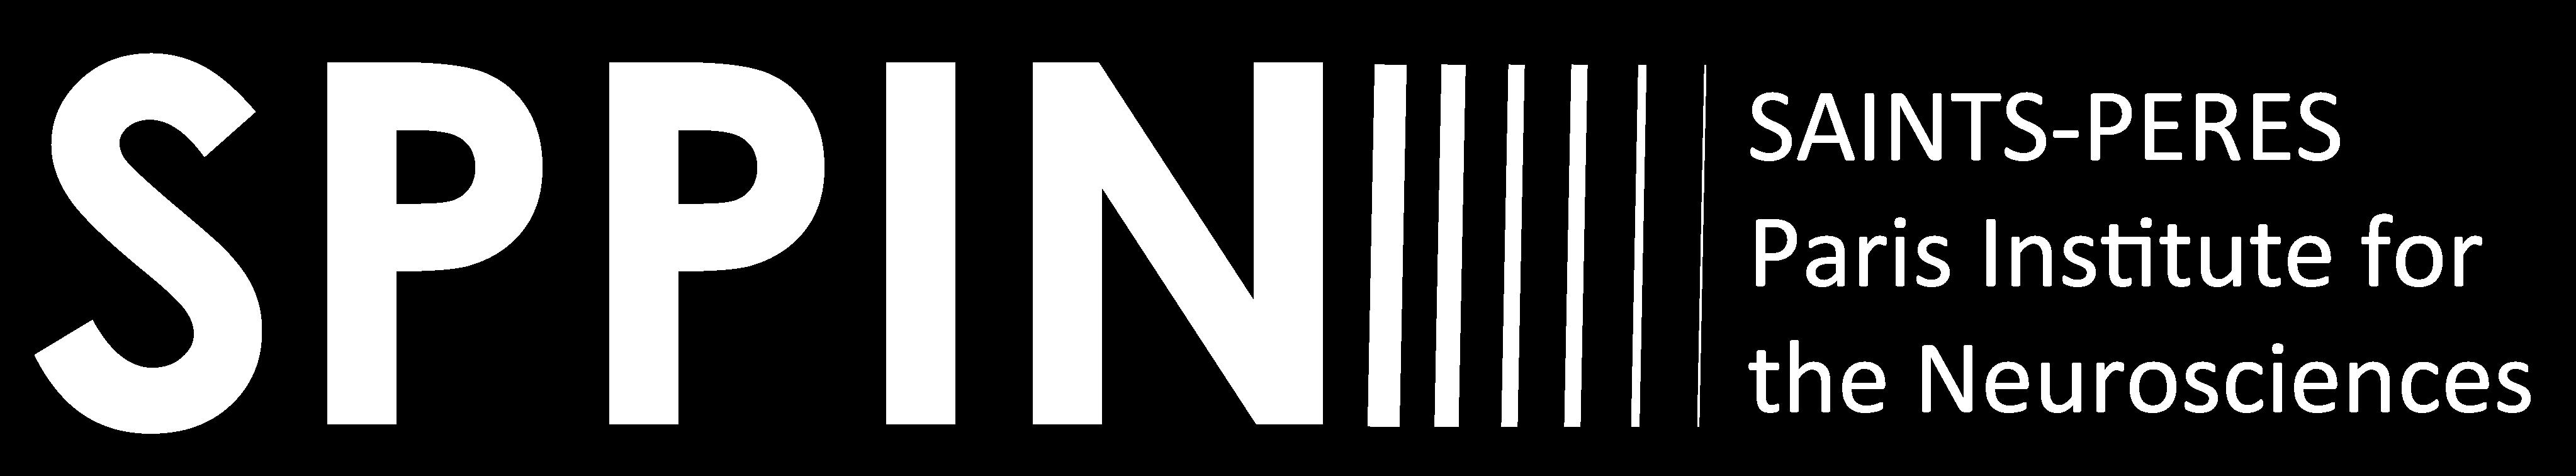 SPPIN - CNRS UMR 8003